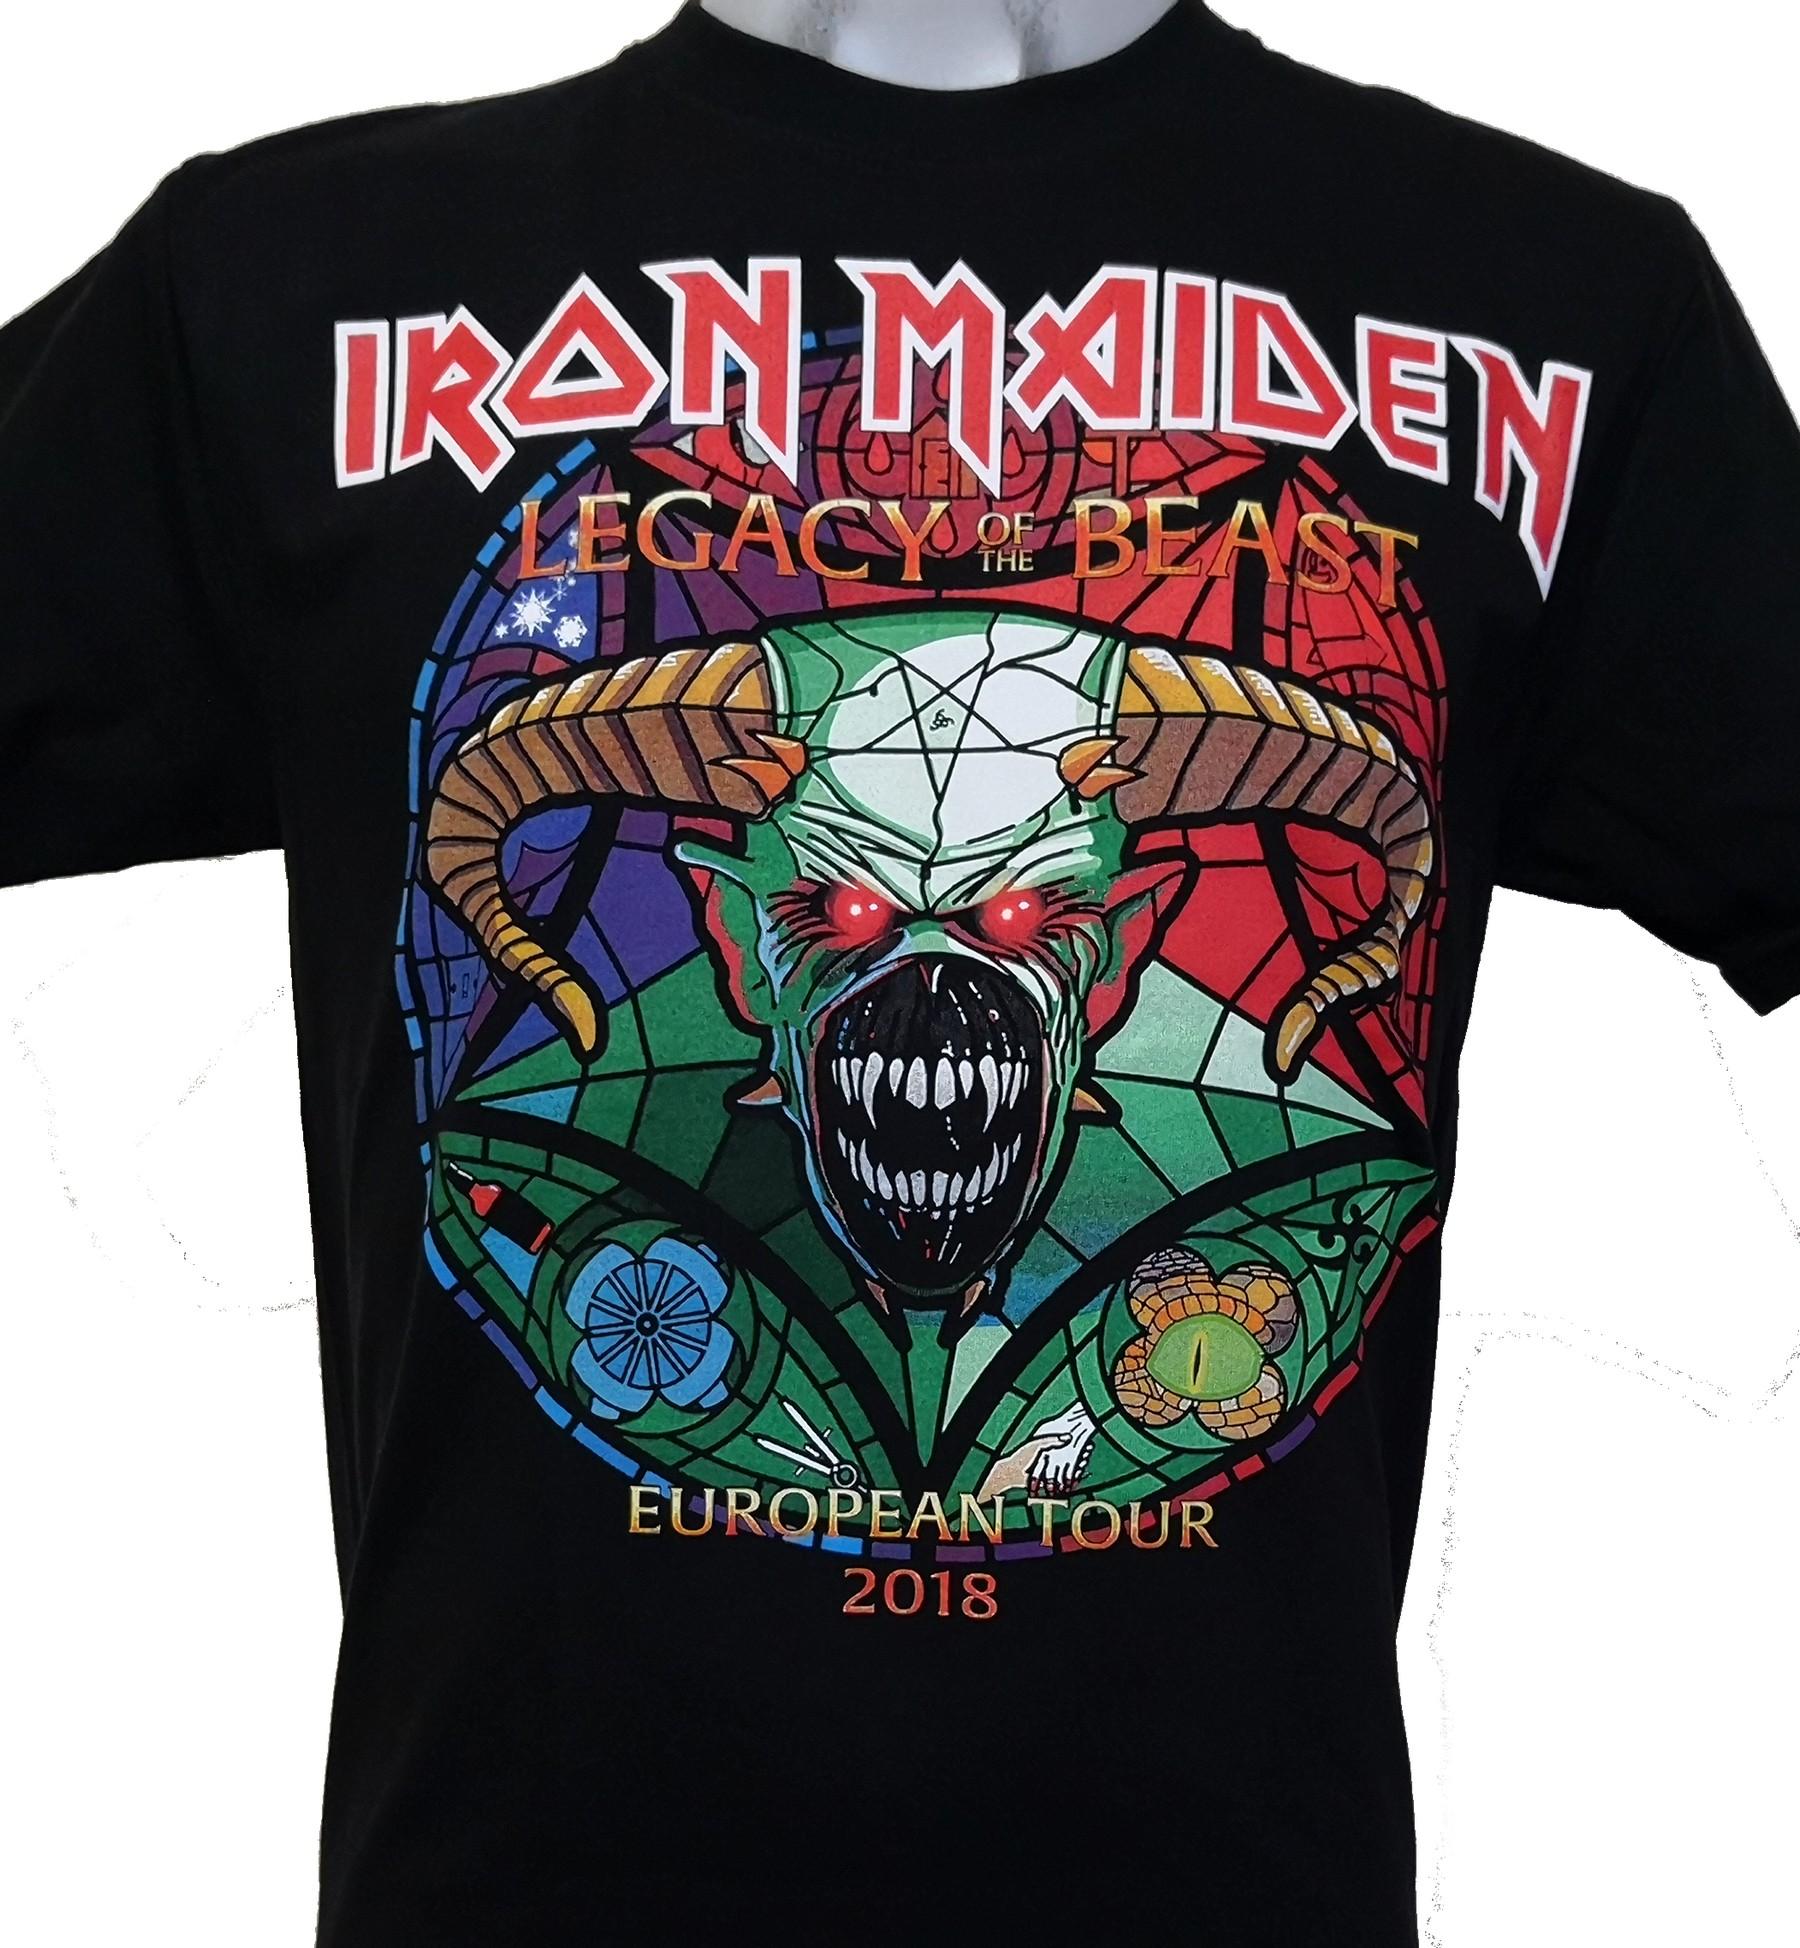 c090d4a2 Iron Maiden t-shirt Legacy of the Beast size L – RoxxBKK